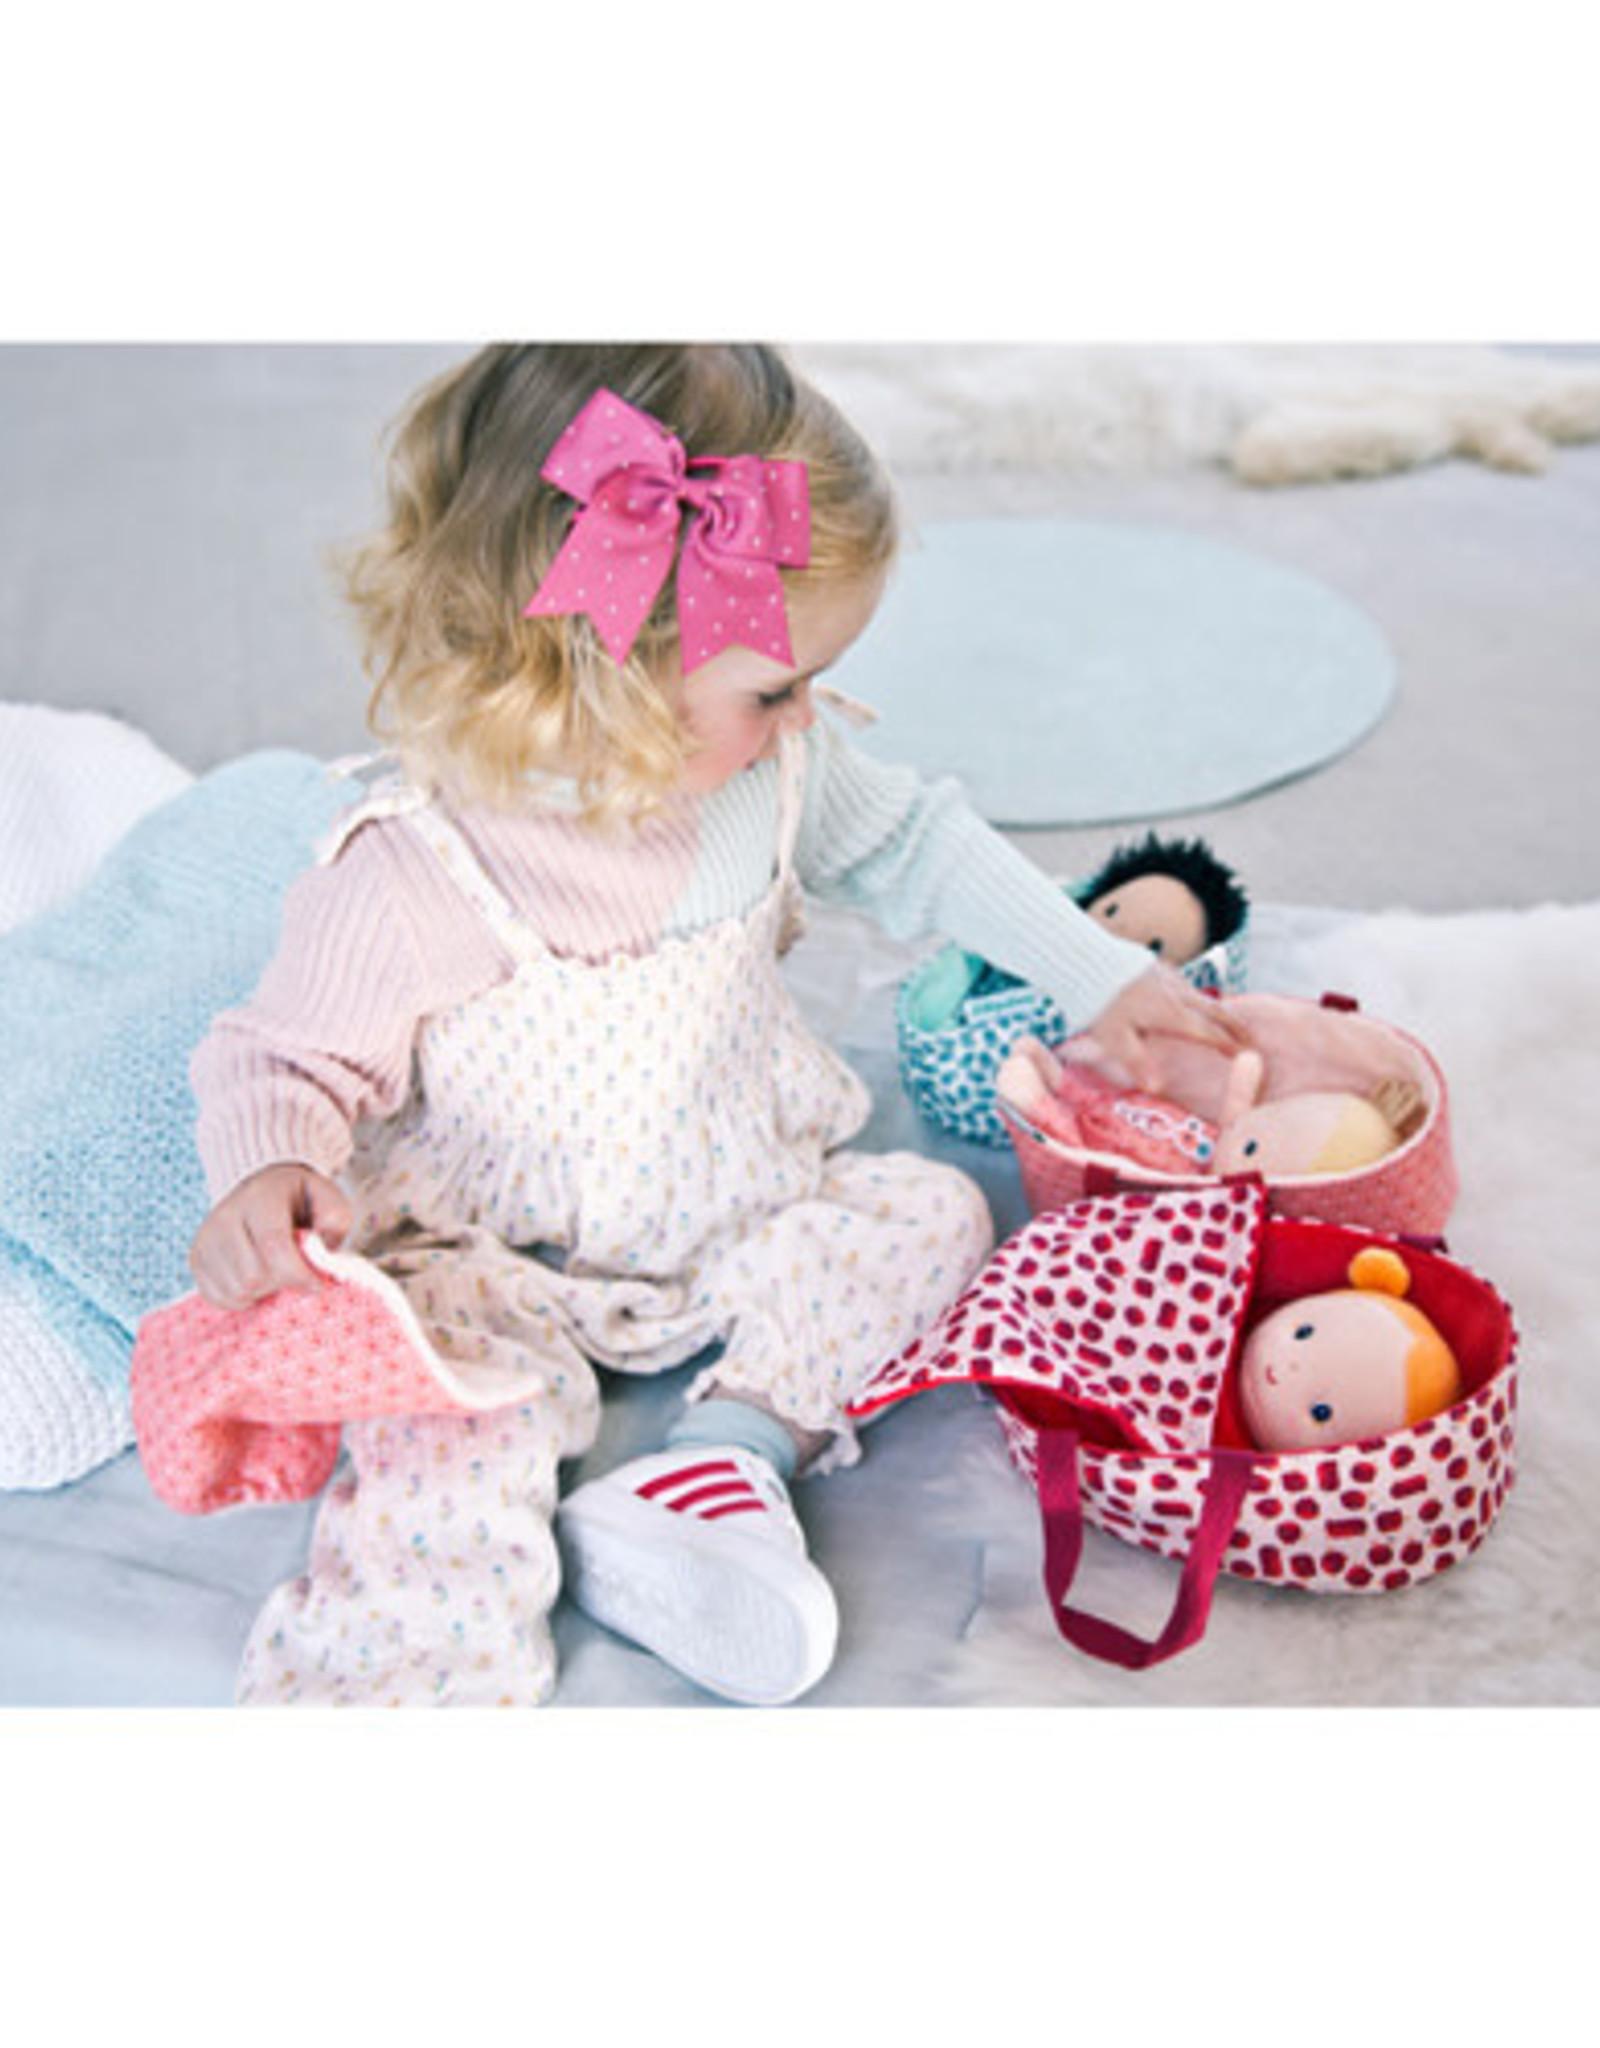 Lilliputiens Baby Agathe